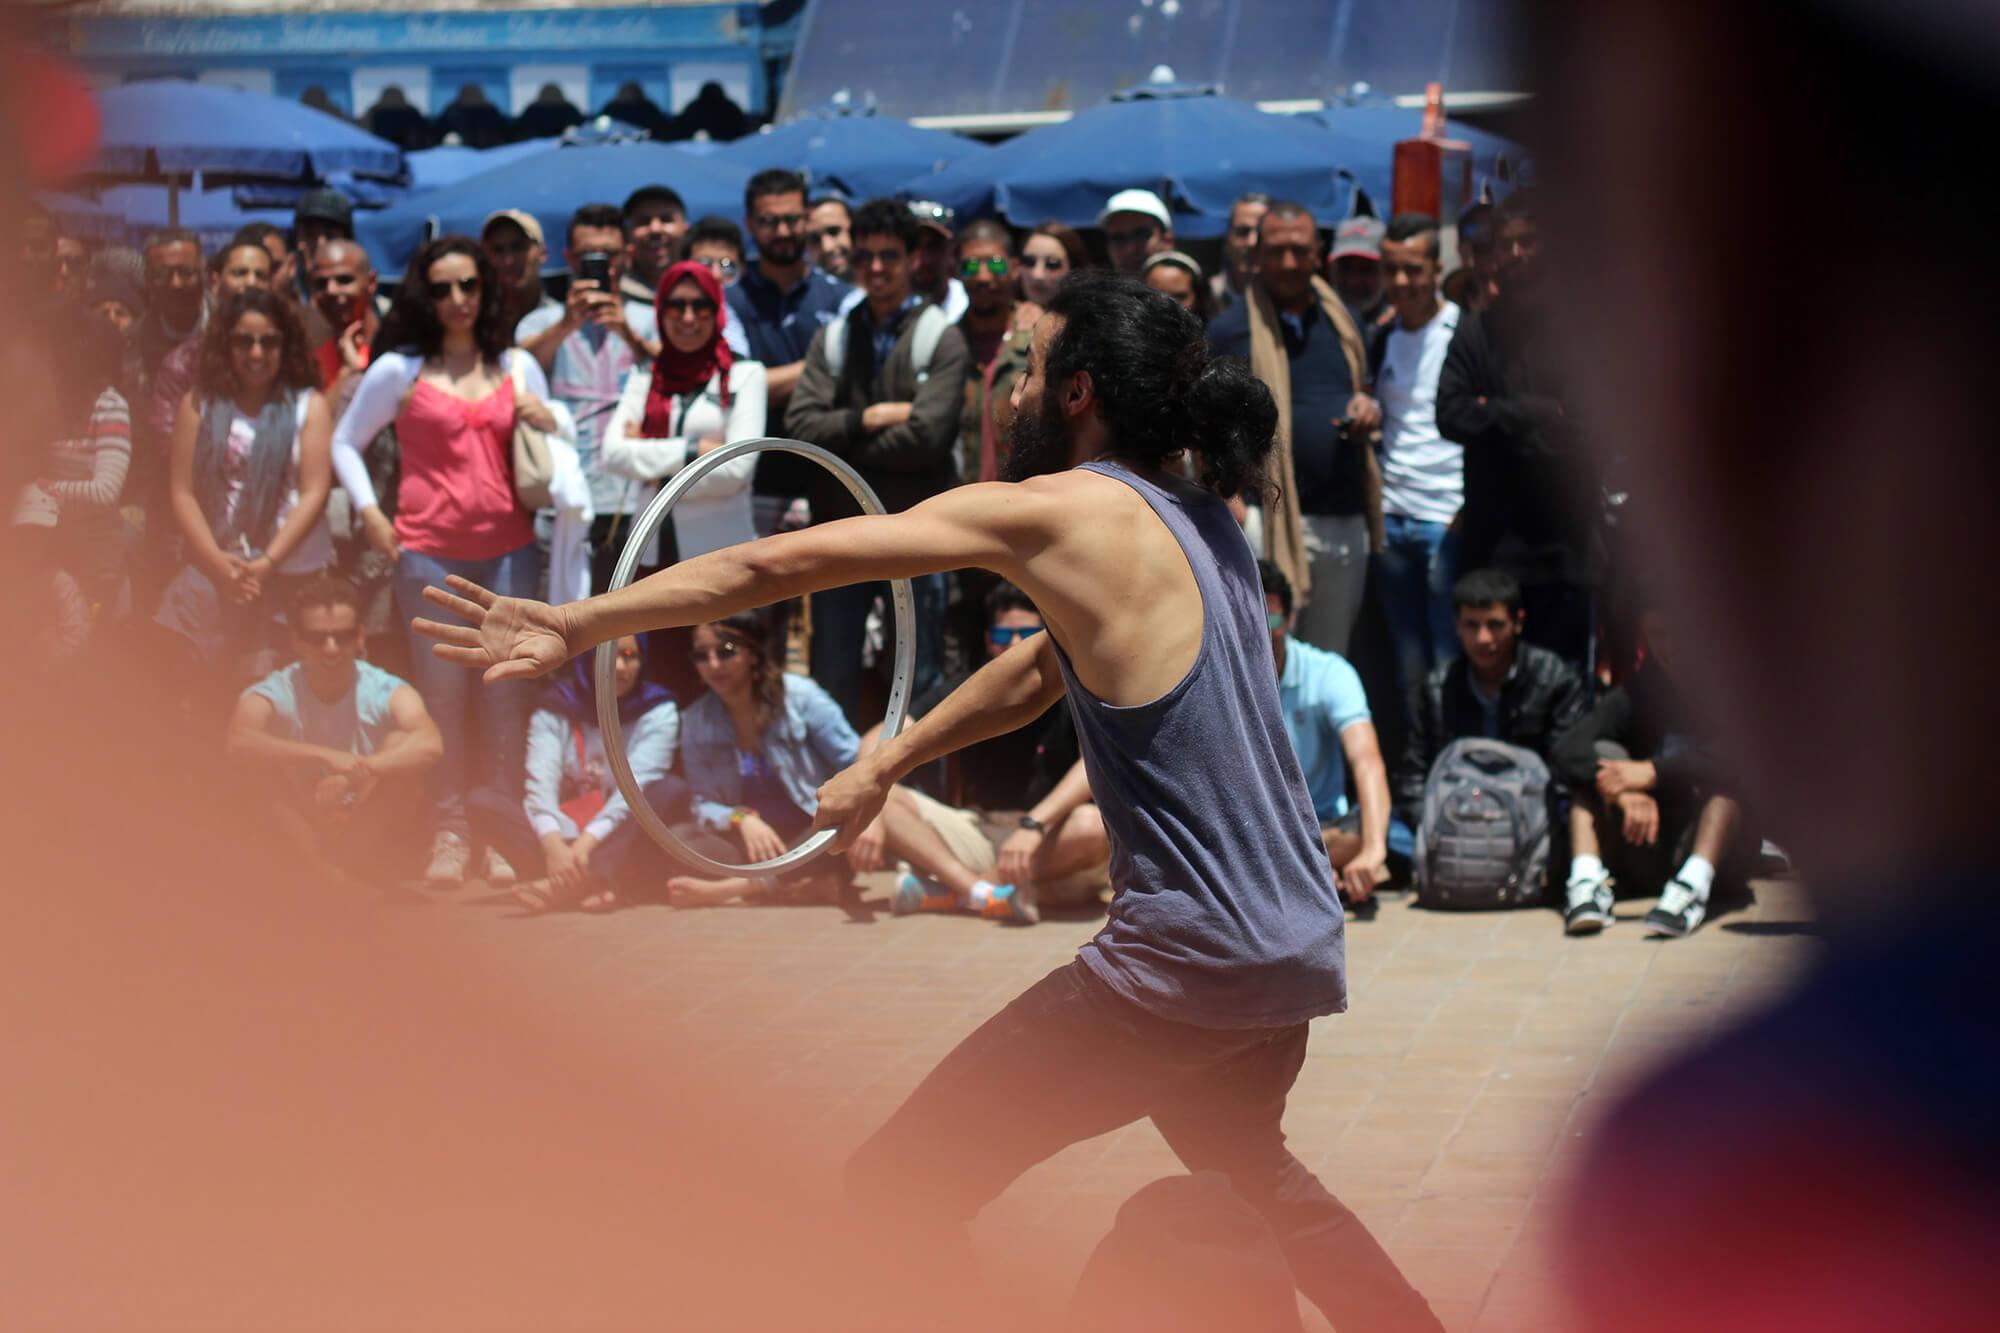 Sahara Desert Tour - Festivals: Discover a More Intimate Side of Morocco - Marrakech Popular Arts Festival